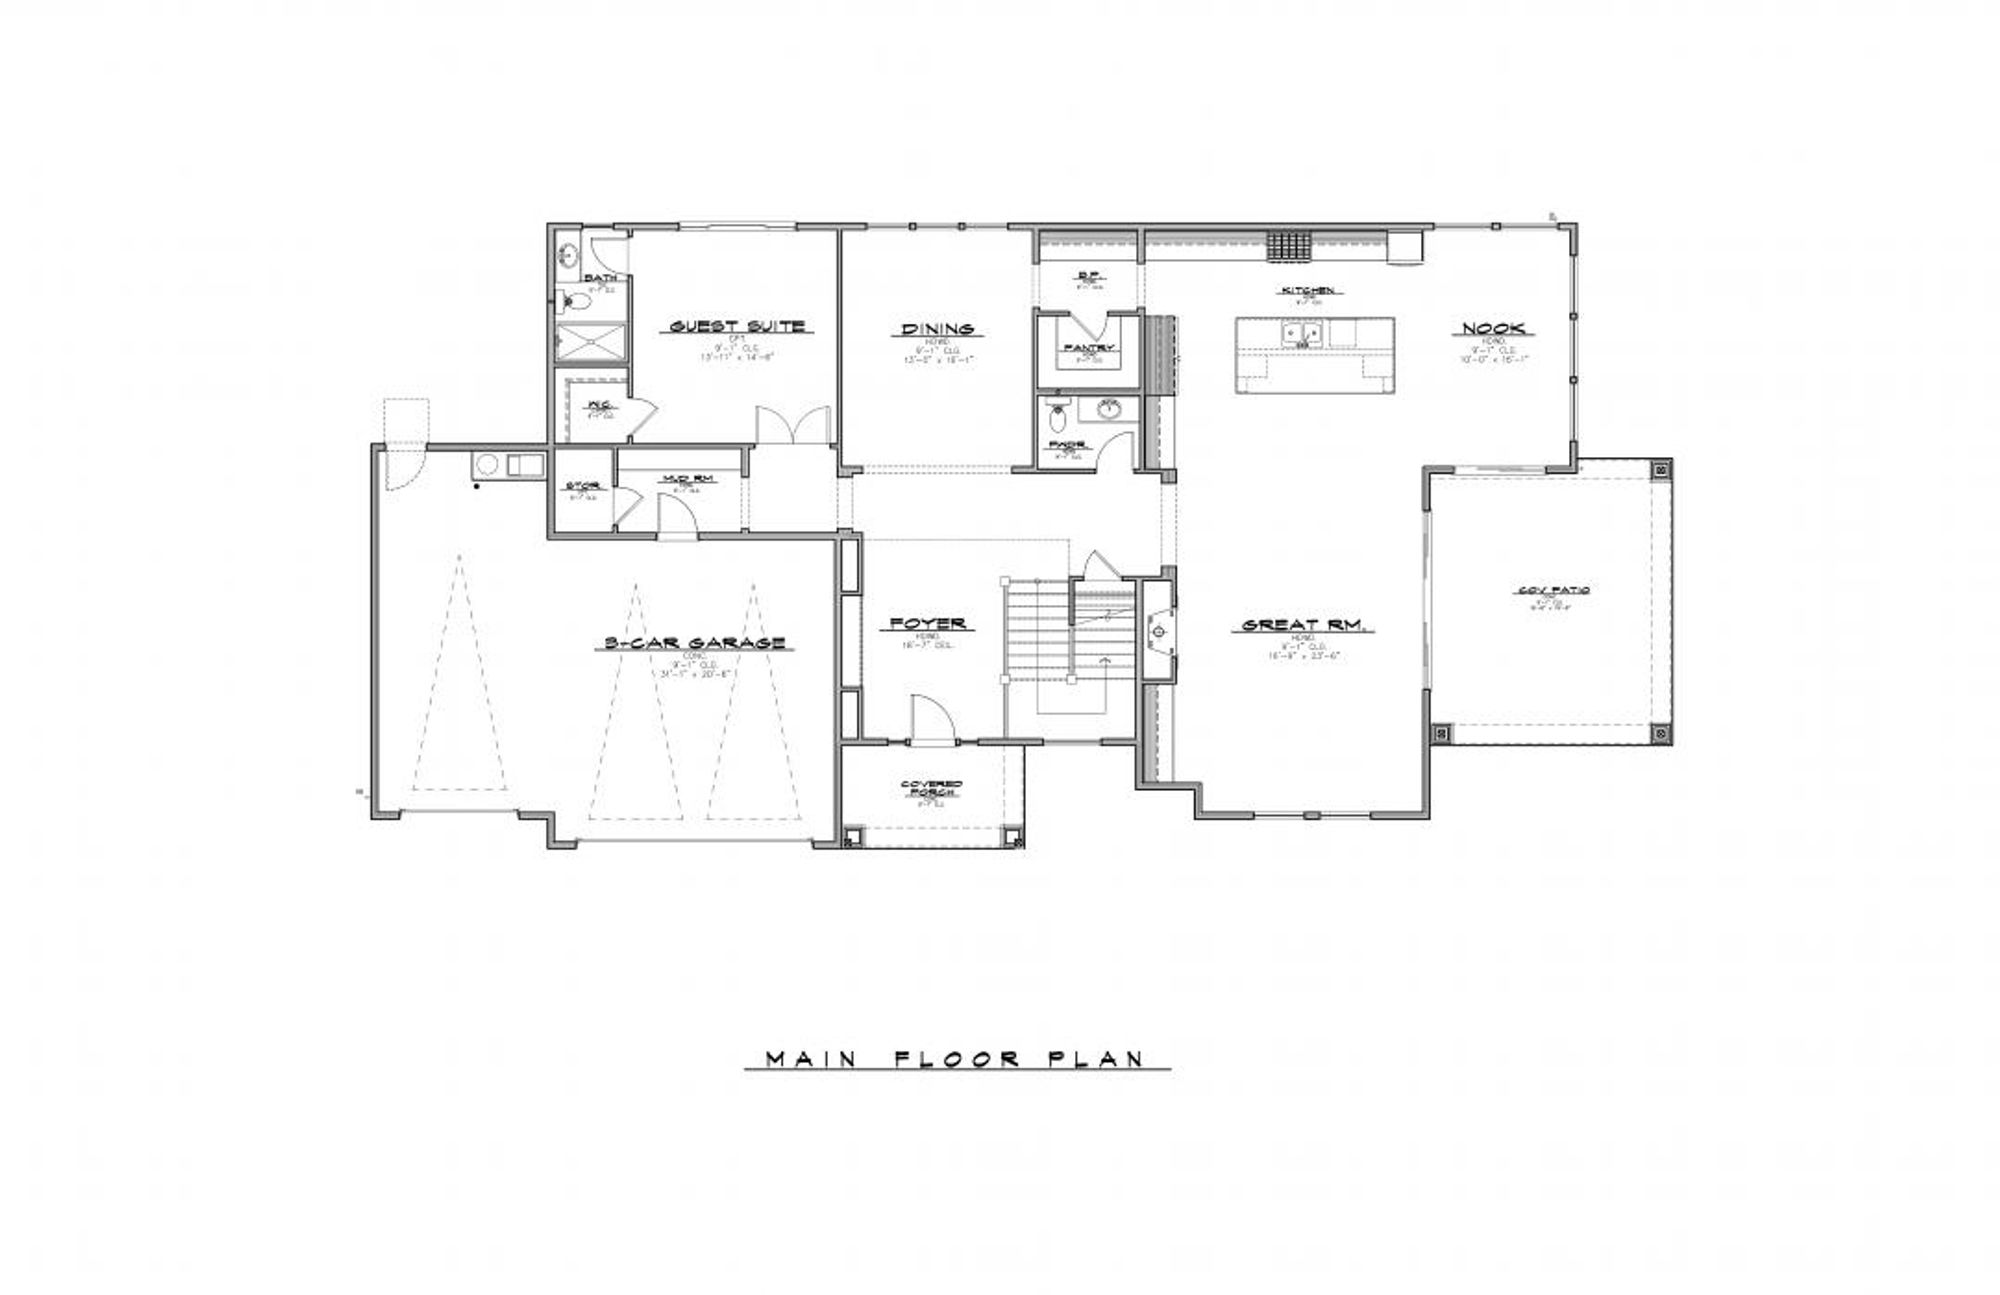 Ravenwood Main Floor Plan